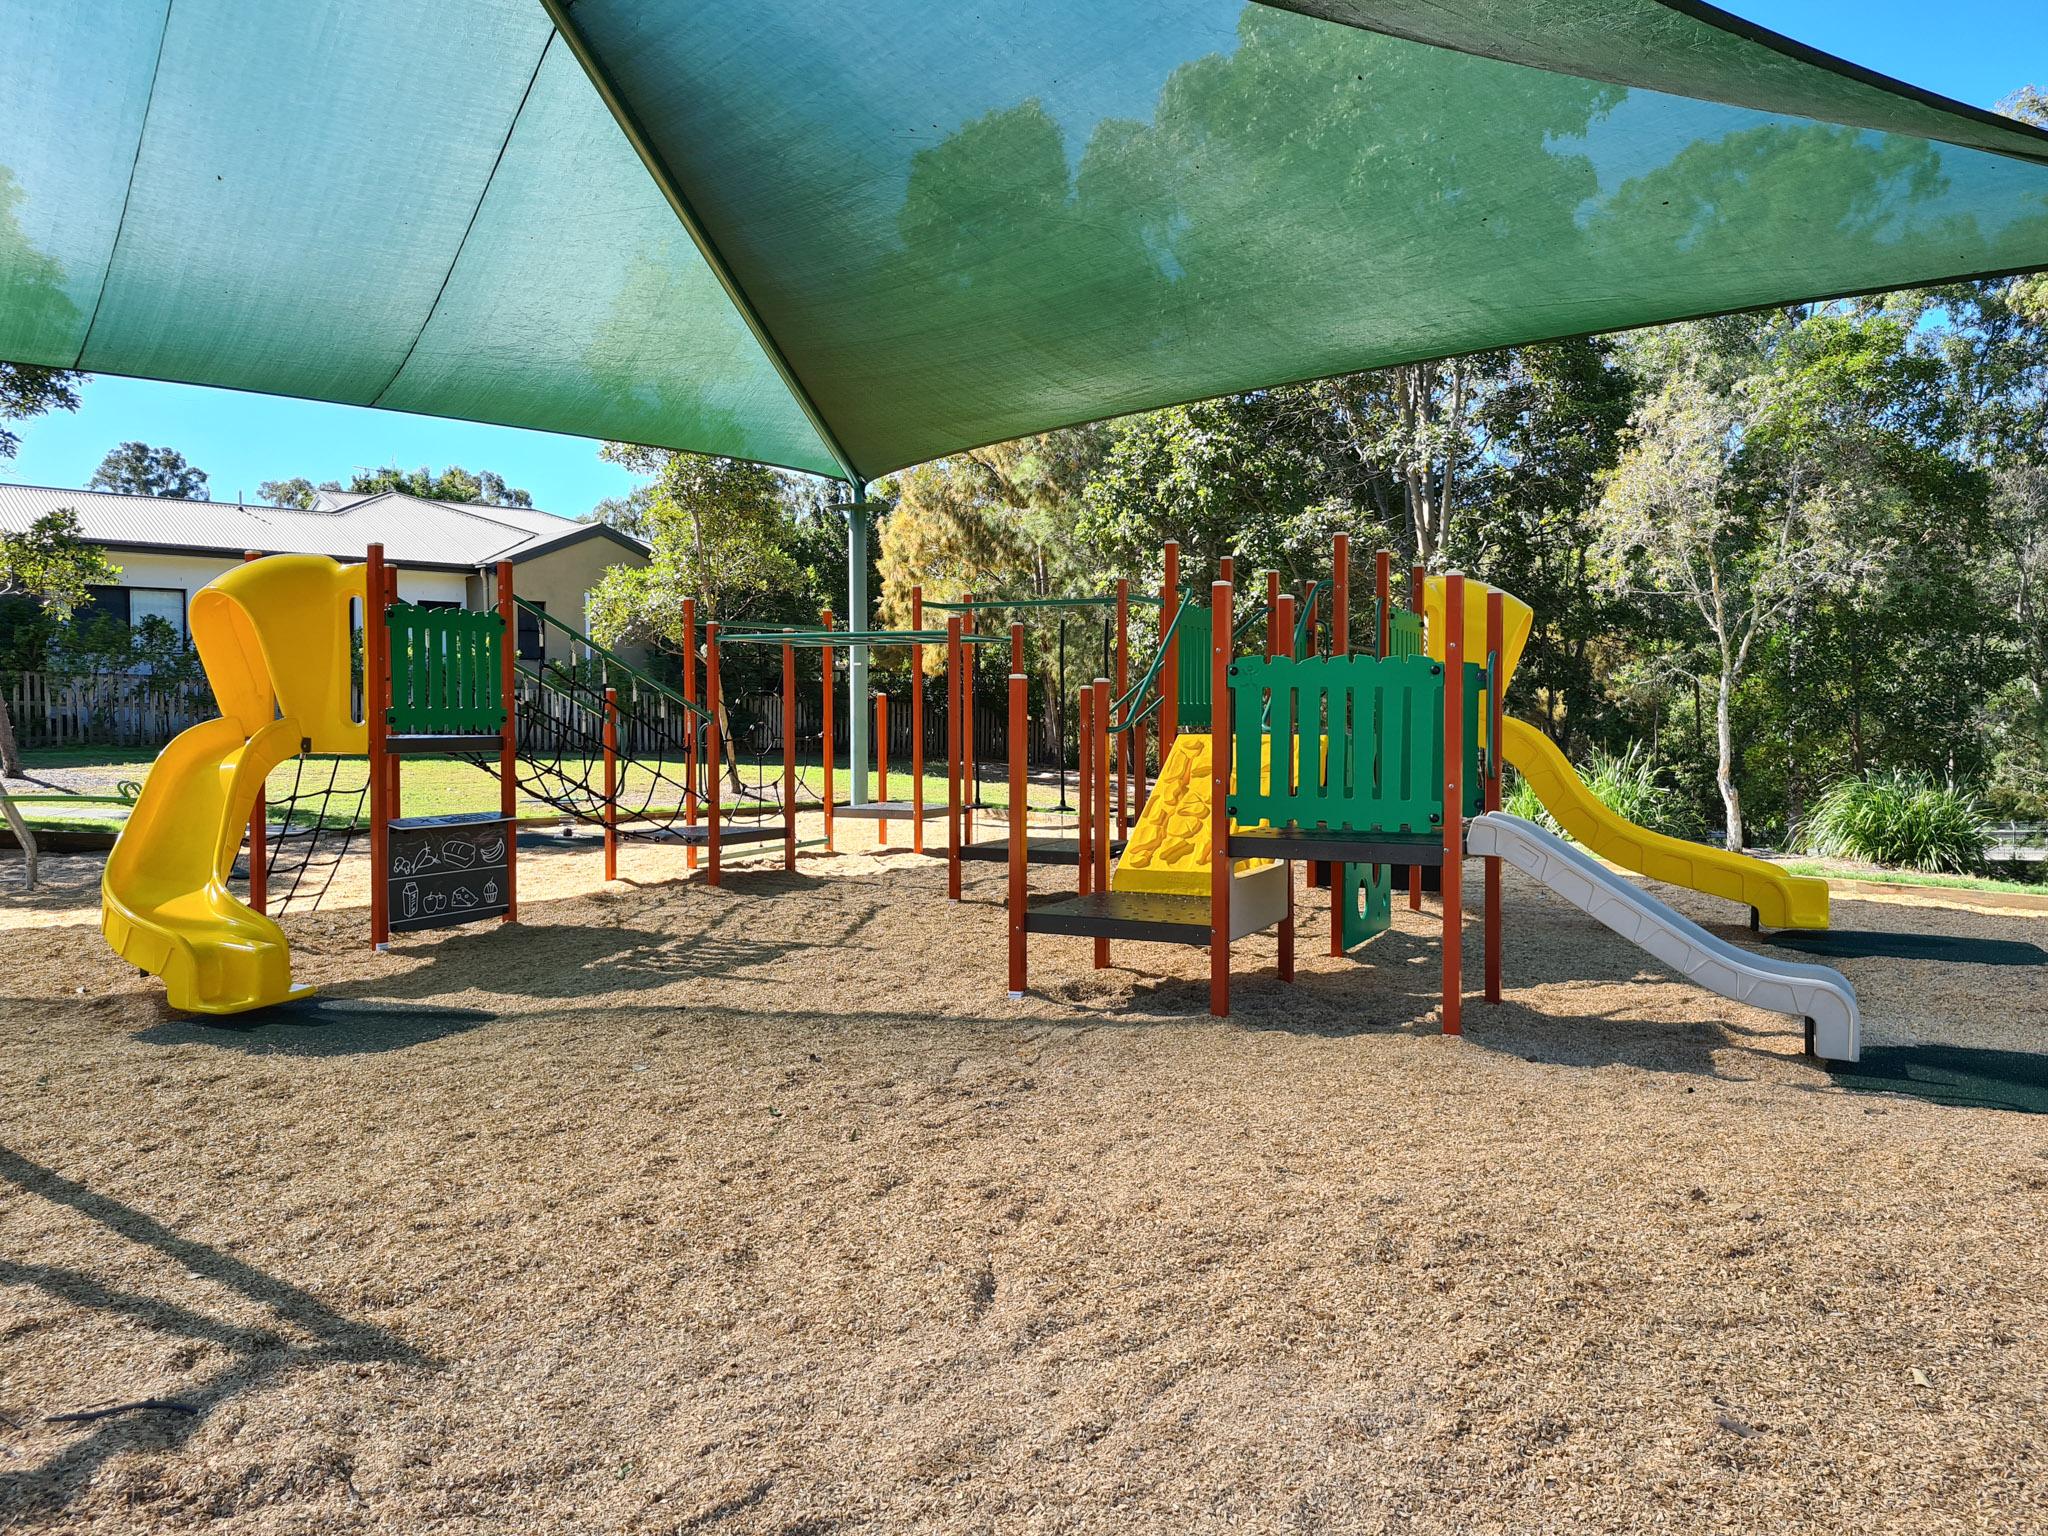 palm-beach-state-school-playrground-austek-play-62